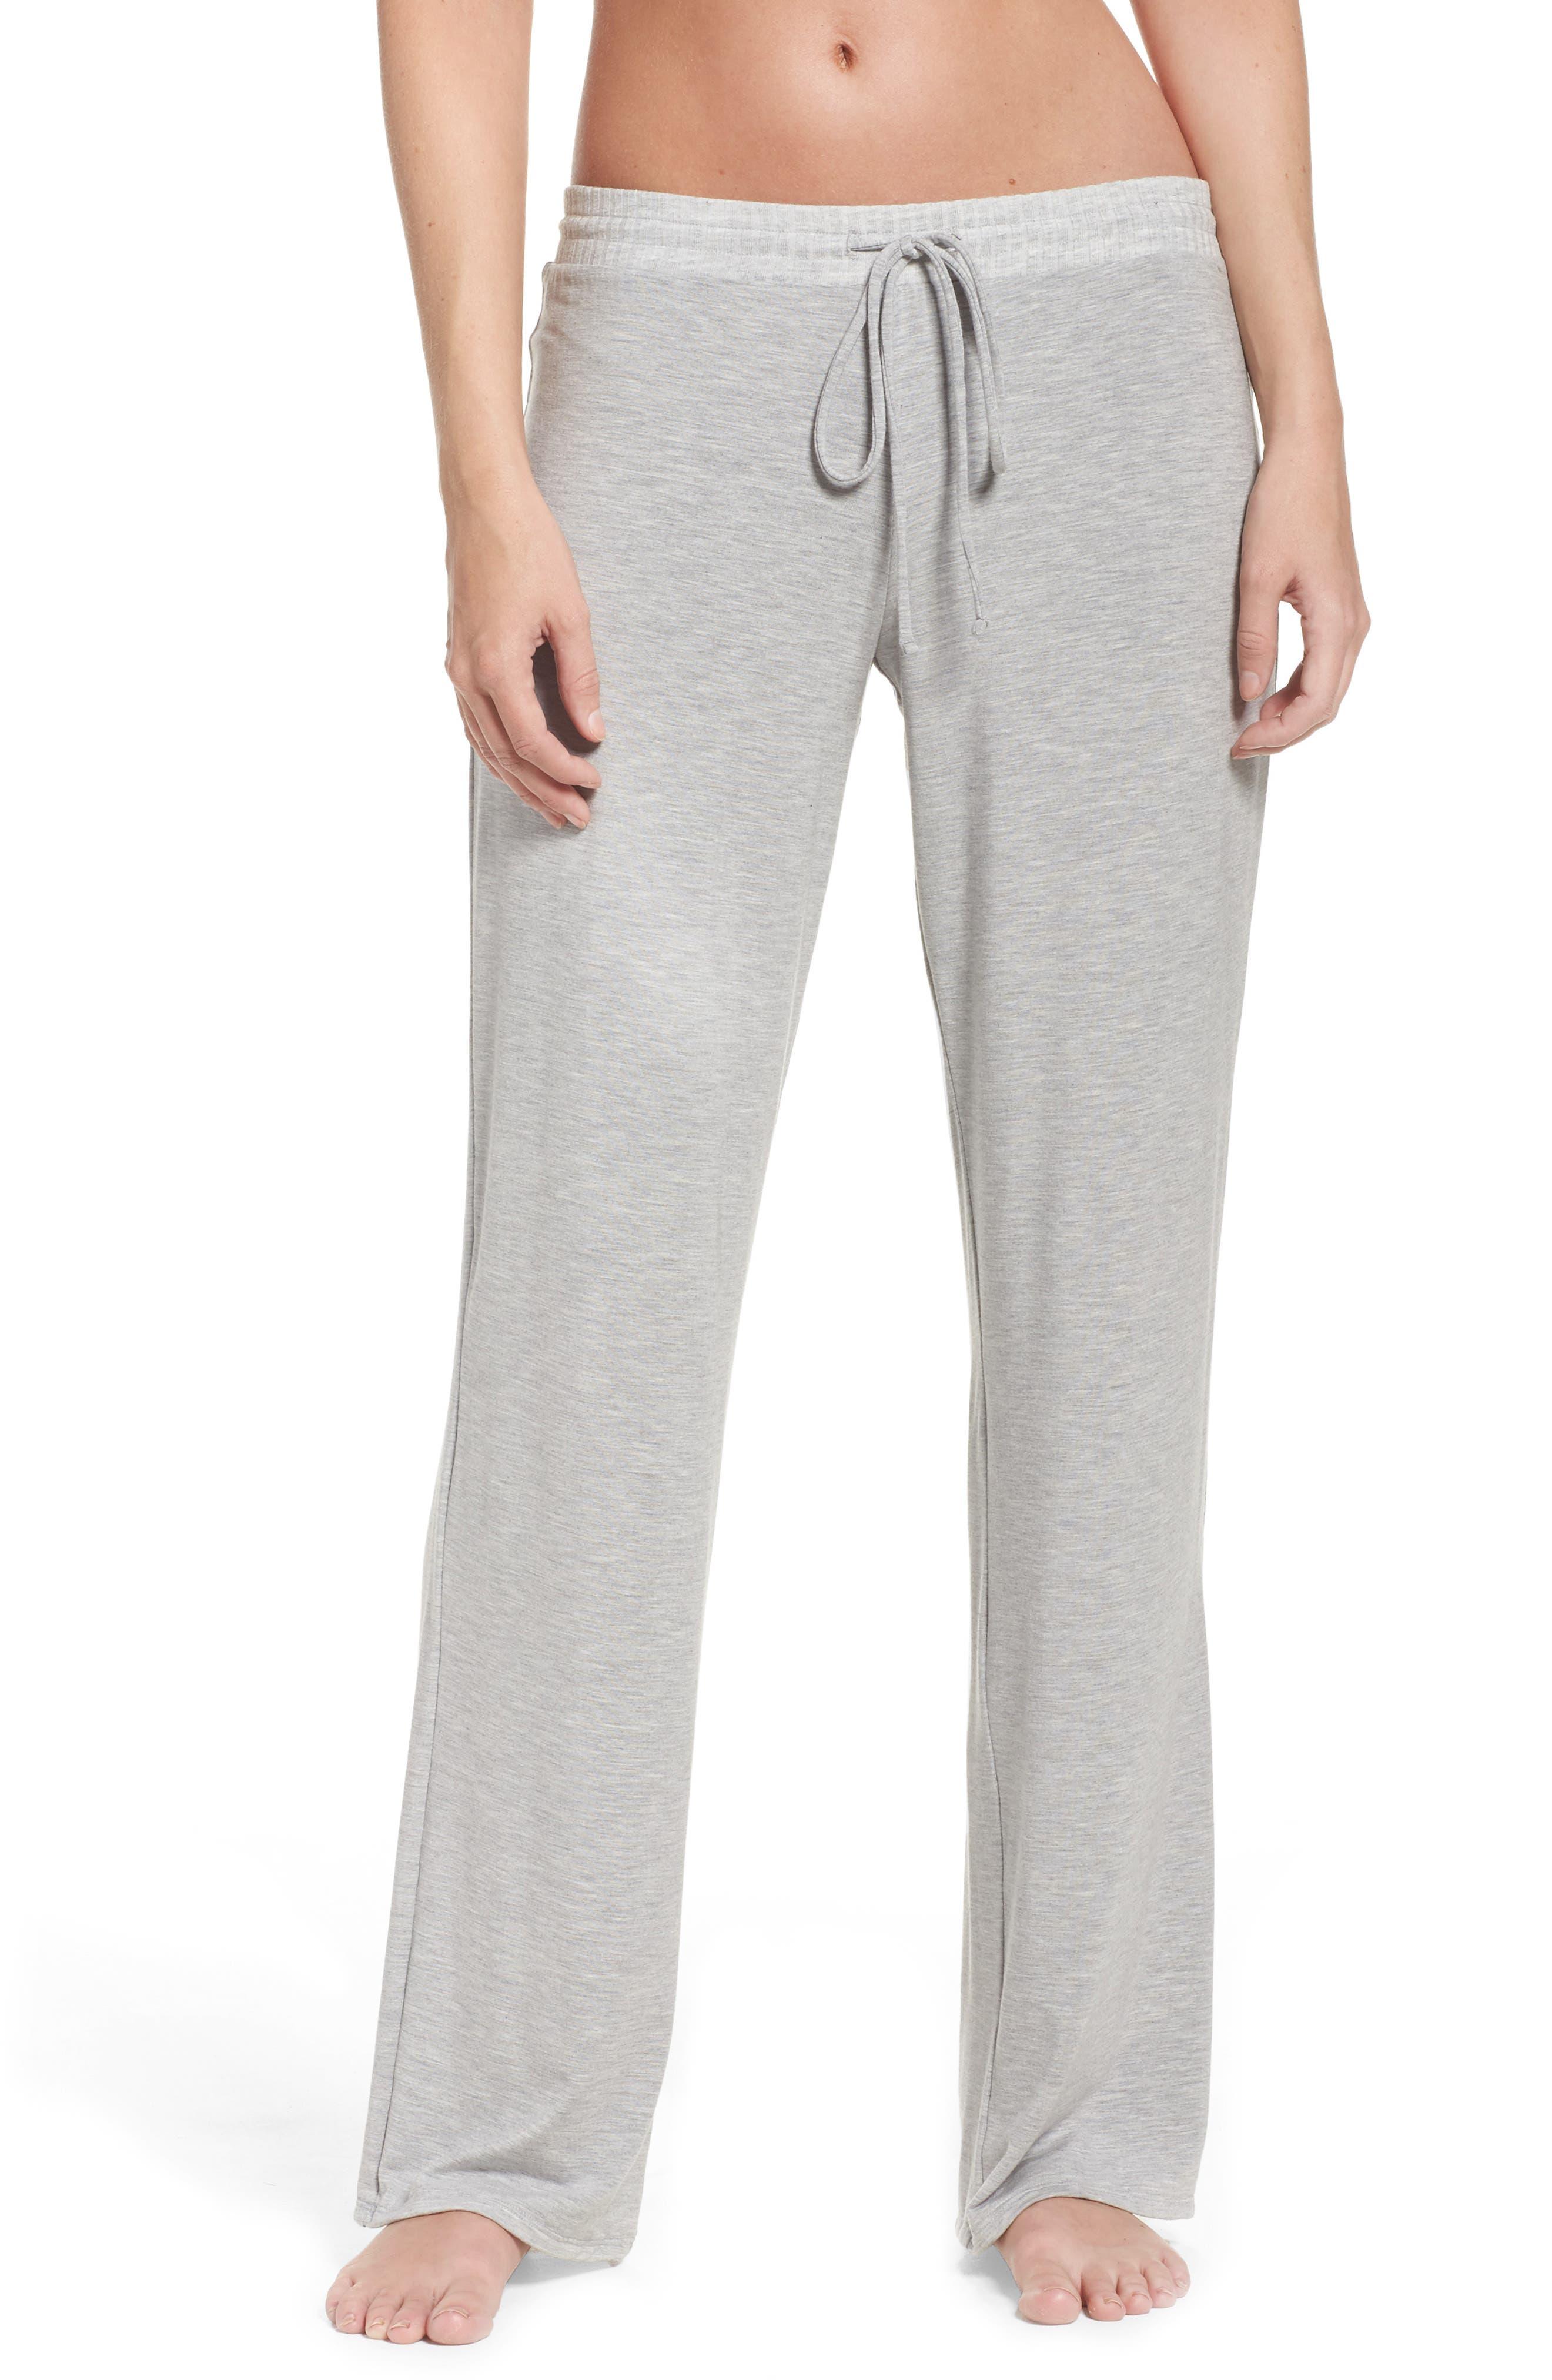 Chelsea Lounge Pants,                         Main,                         color, Heather Grey